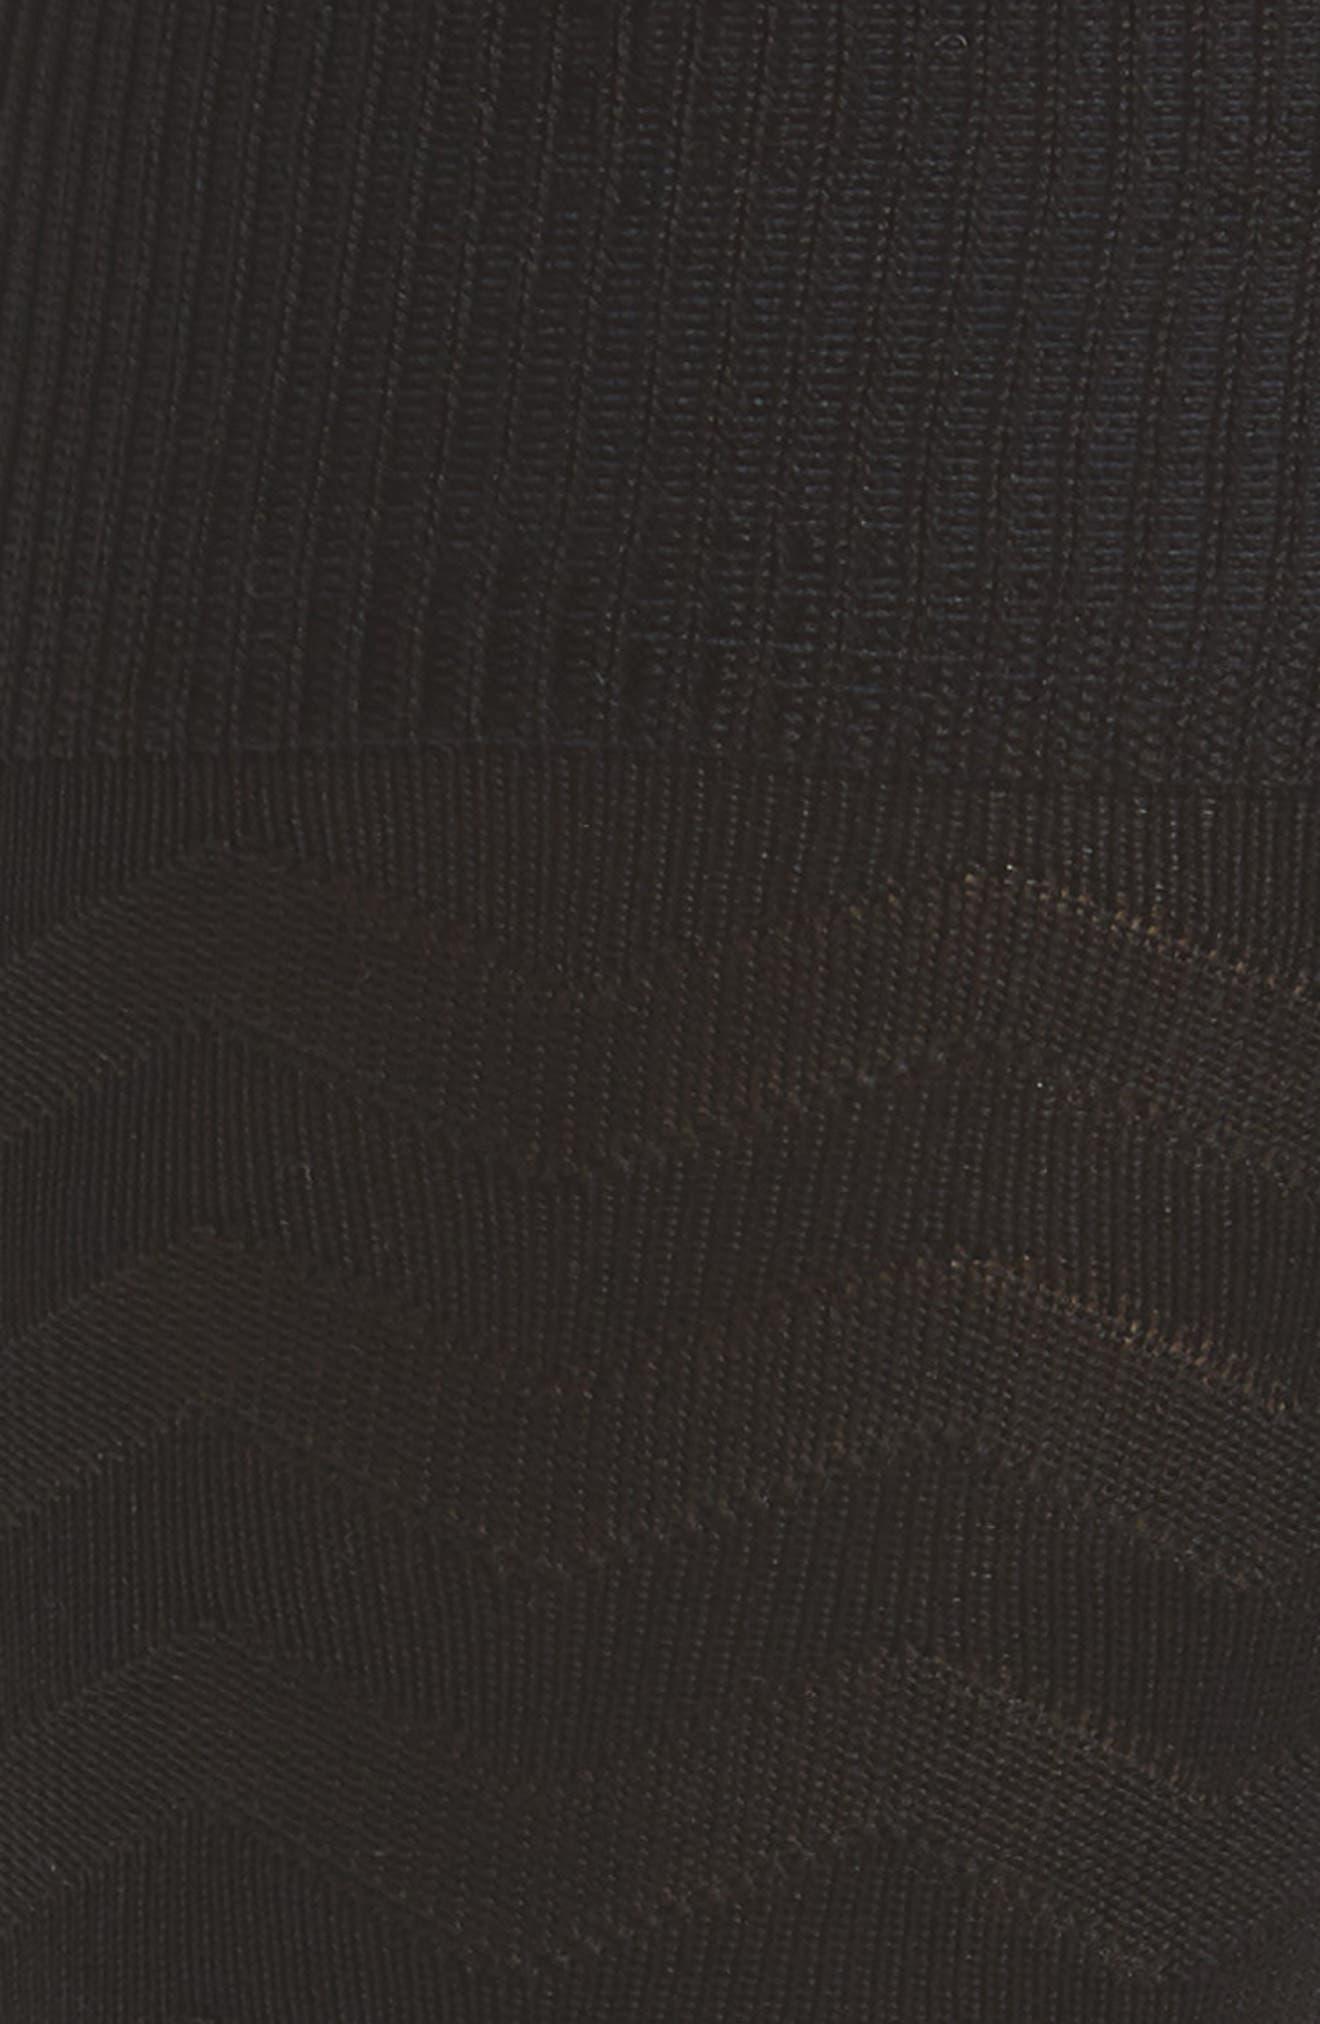 Zigzag Socks,                             Alternate thumbnail 2, color,                             Black